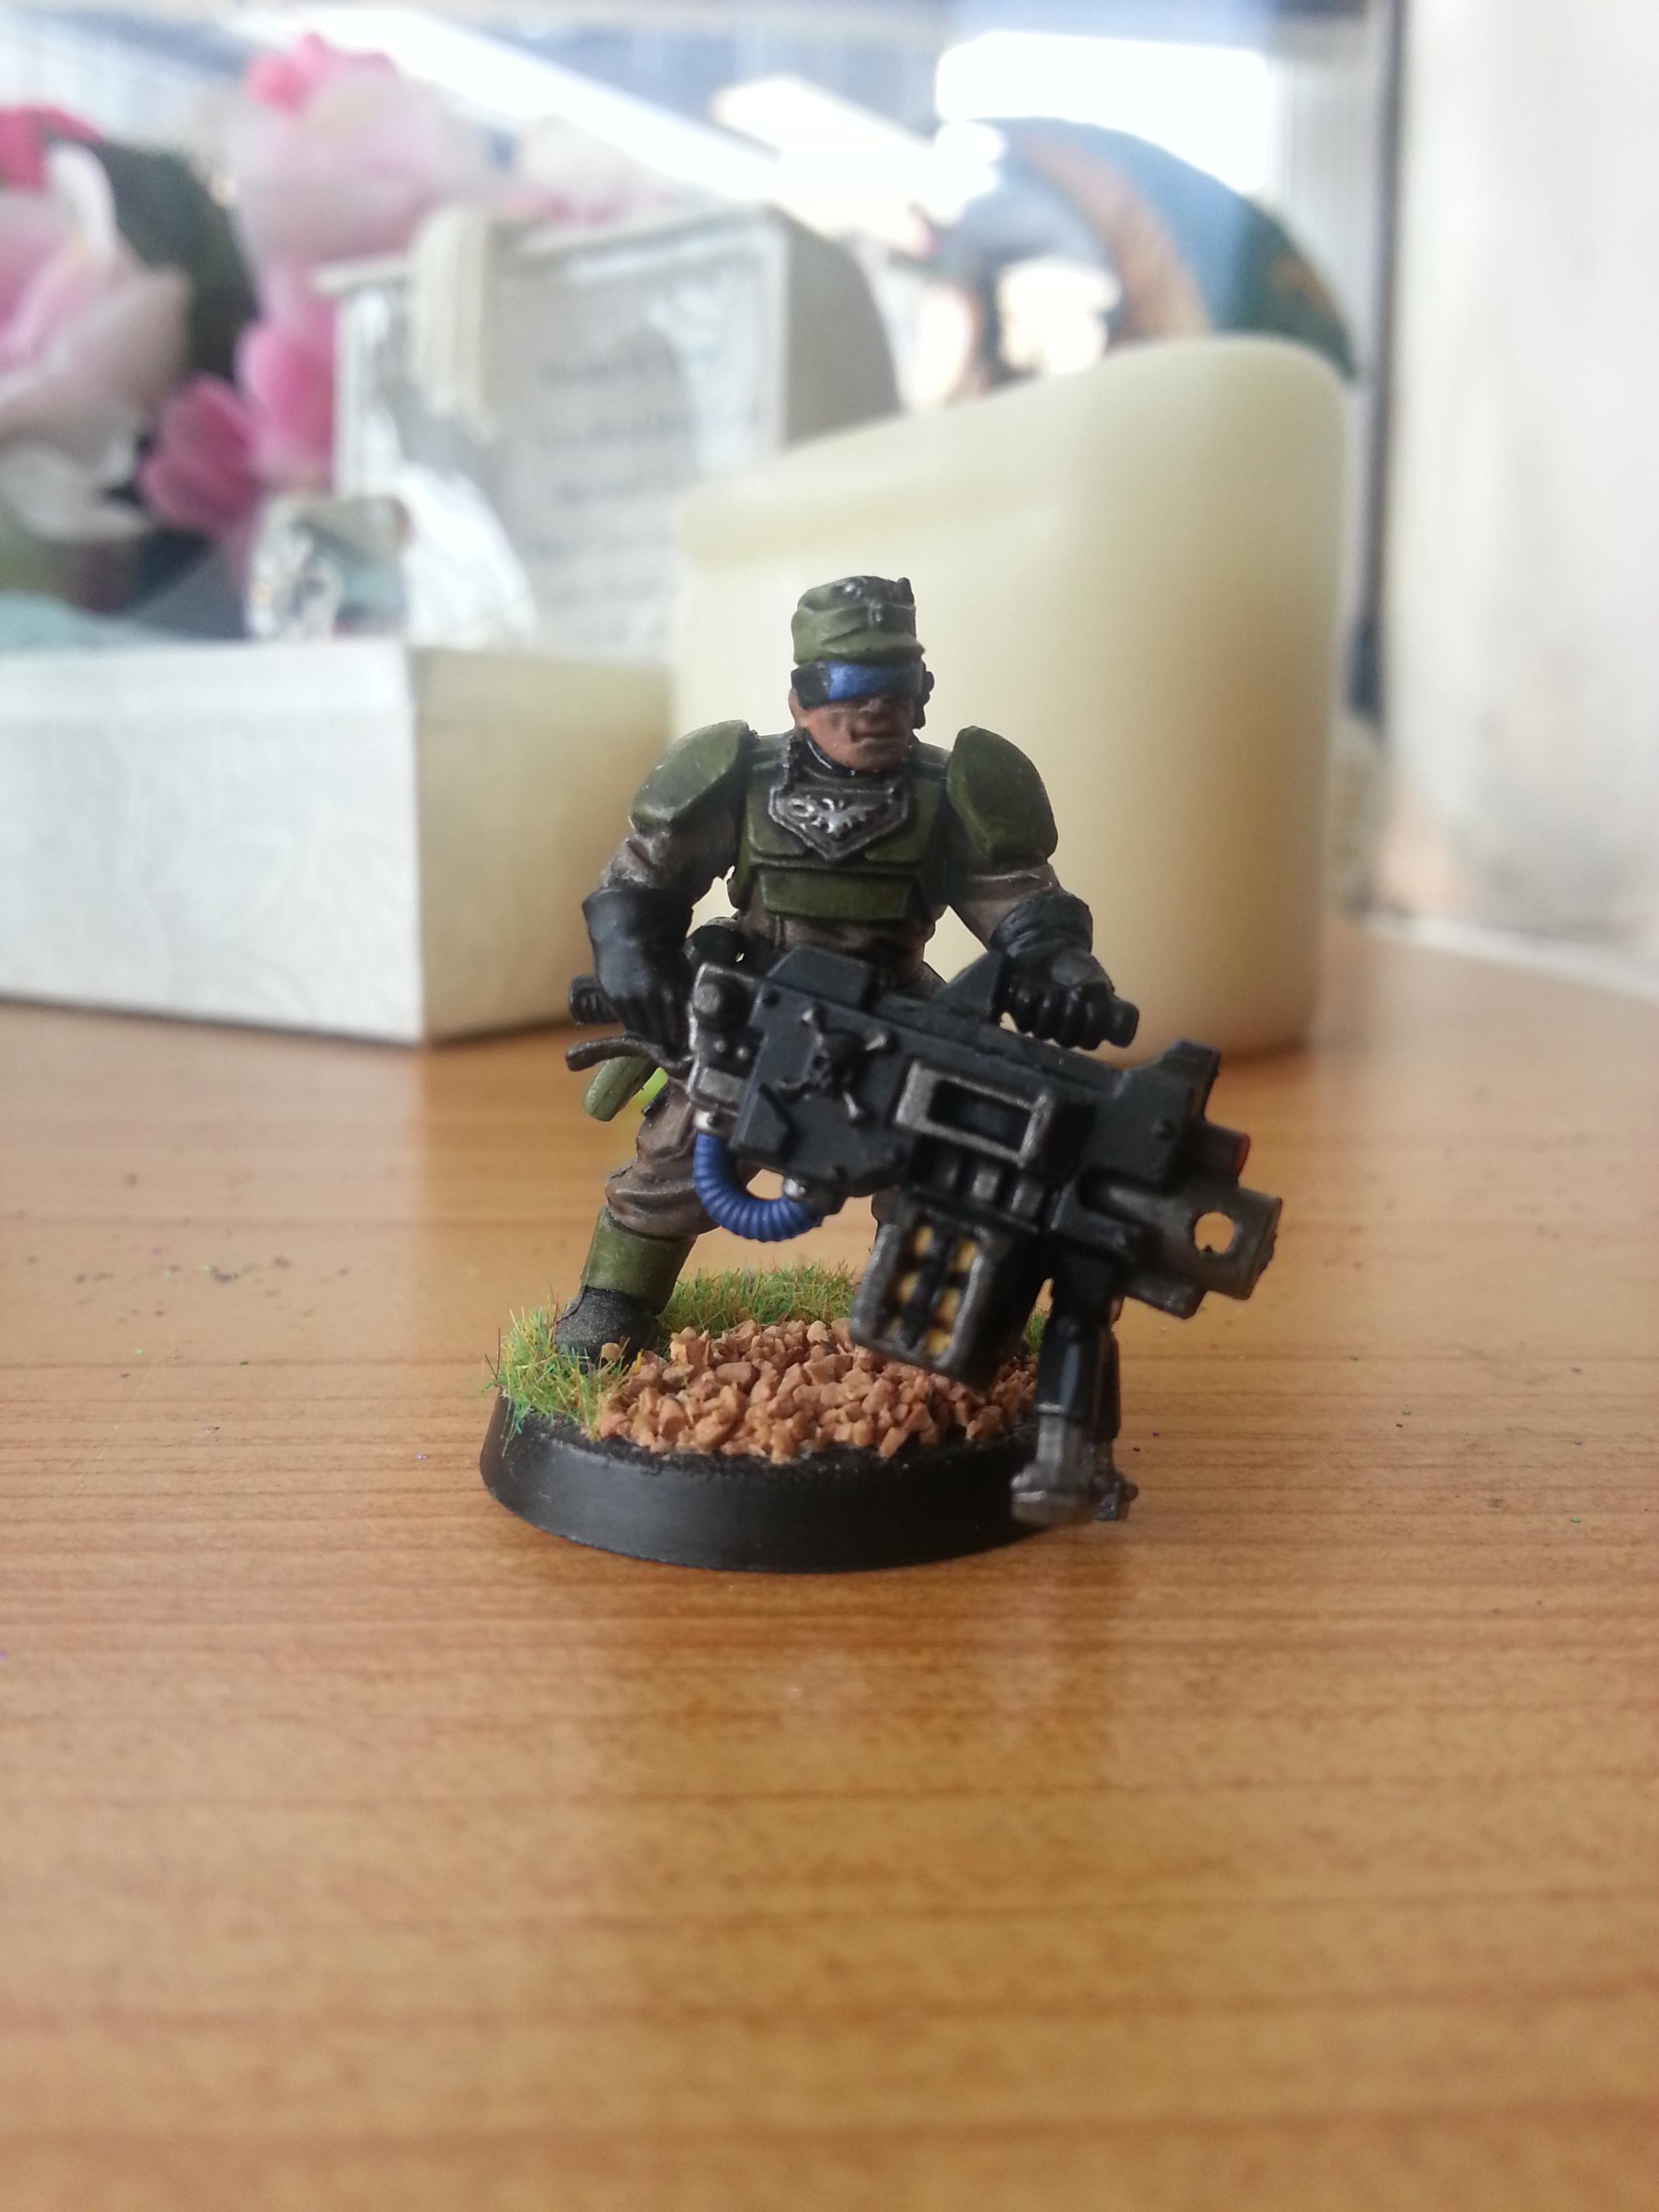 Astra Militarum, Gunnery Sergeant Harker, Imperial Guard